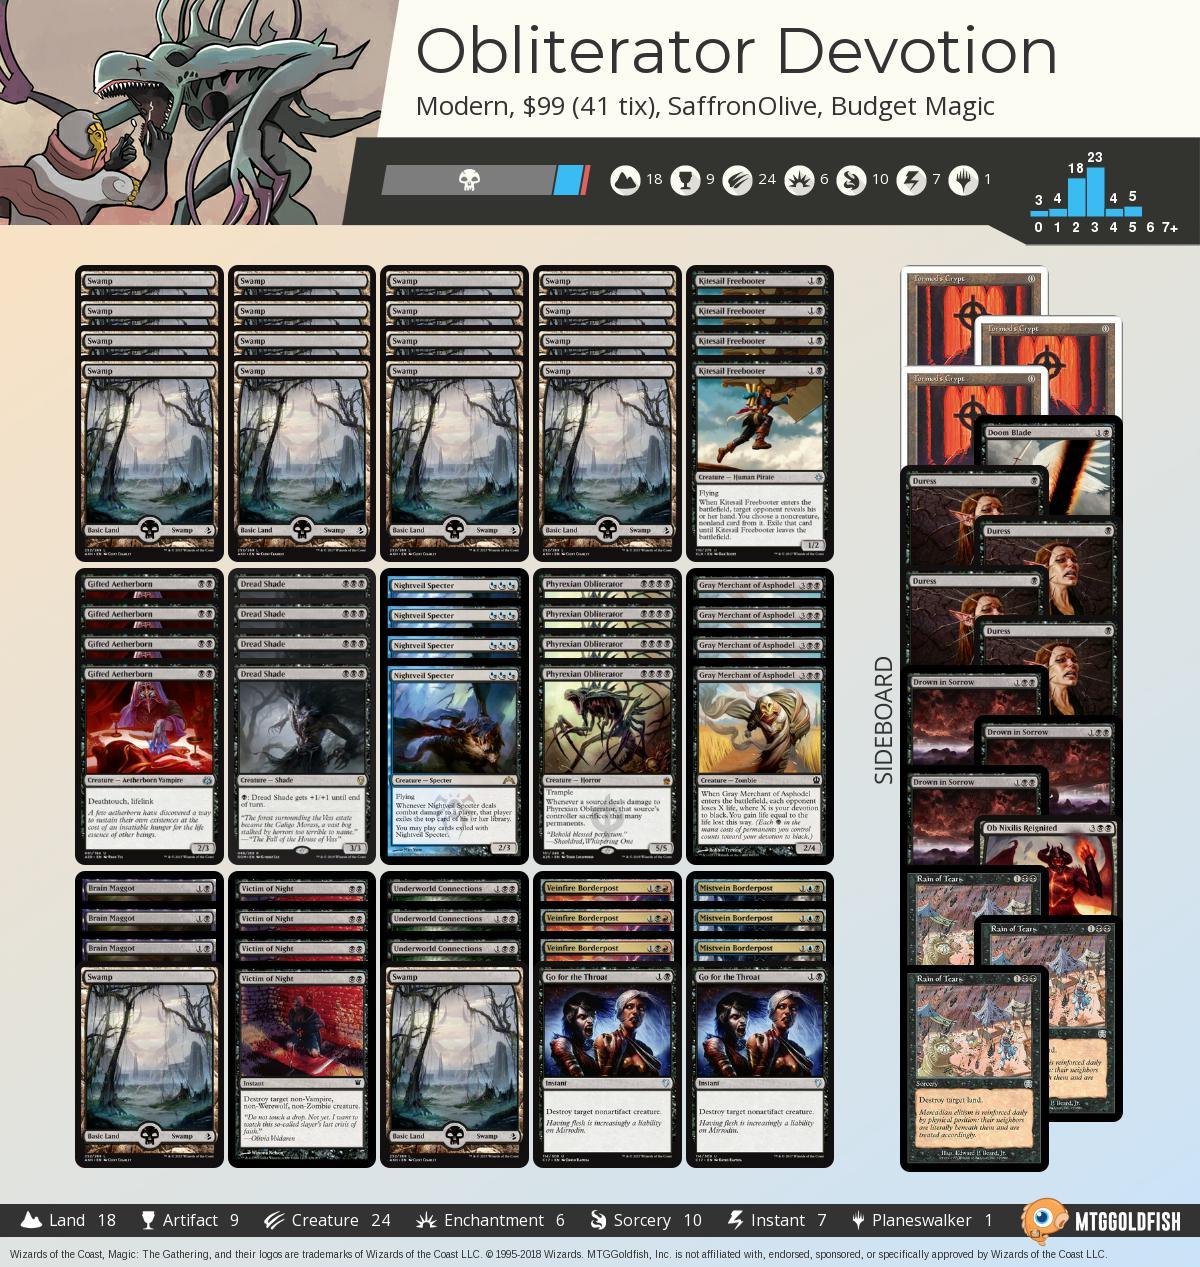 Obliterator%2bdevotion 6814a05b 97b2 4c3c aba2 2e63429924f7%2ejpg